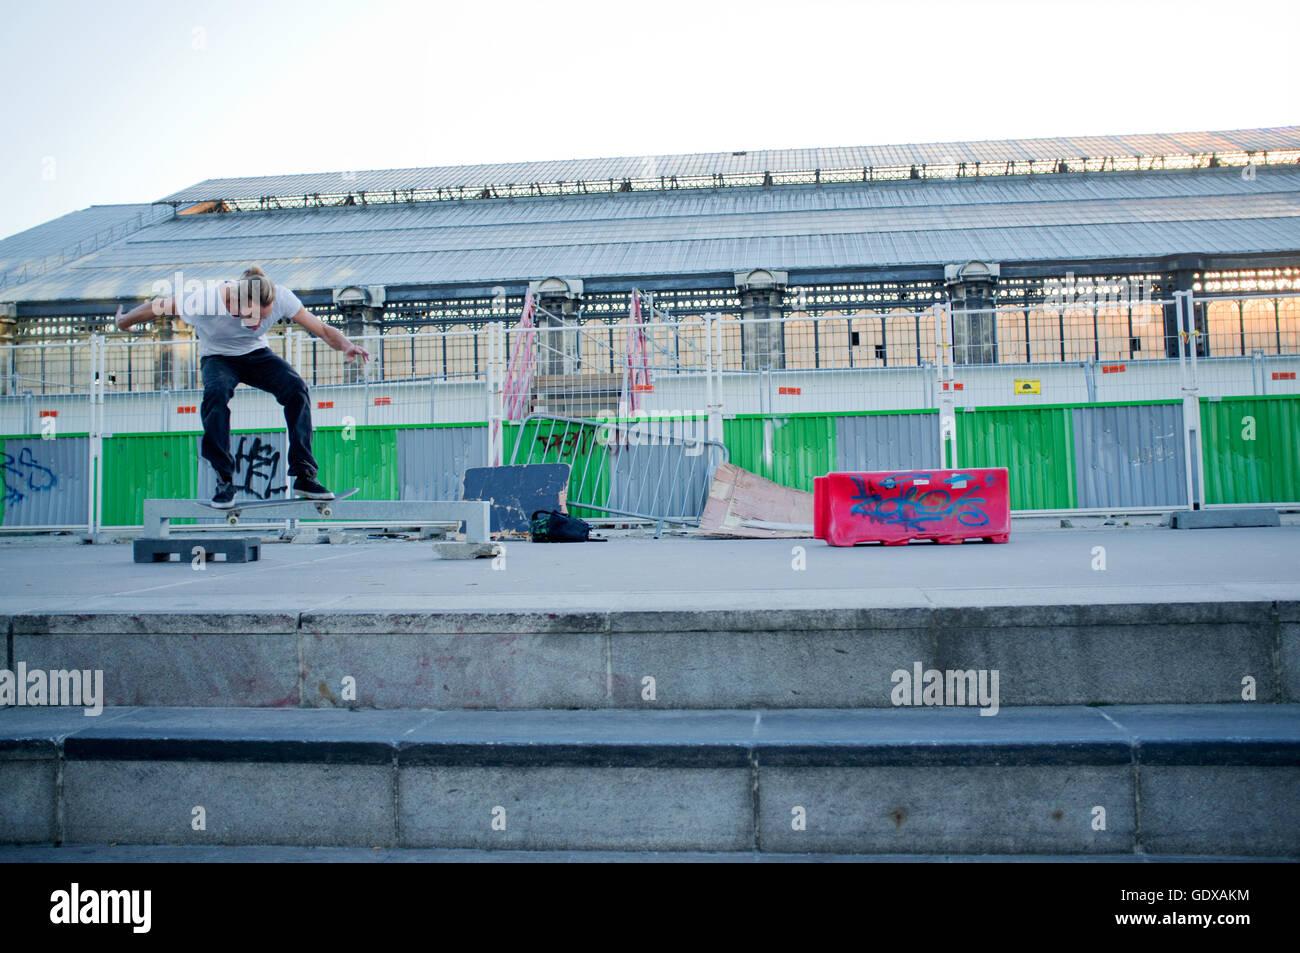 Airborne Skateboarder jumps in front of Gard d' Austerlitz, Paris. - Stock Image